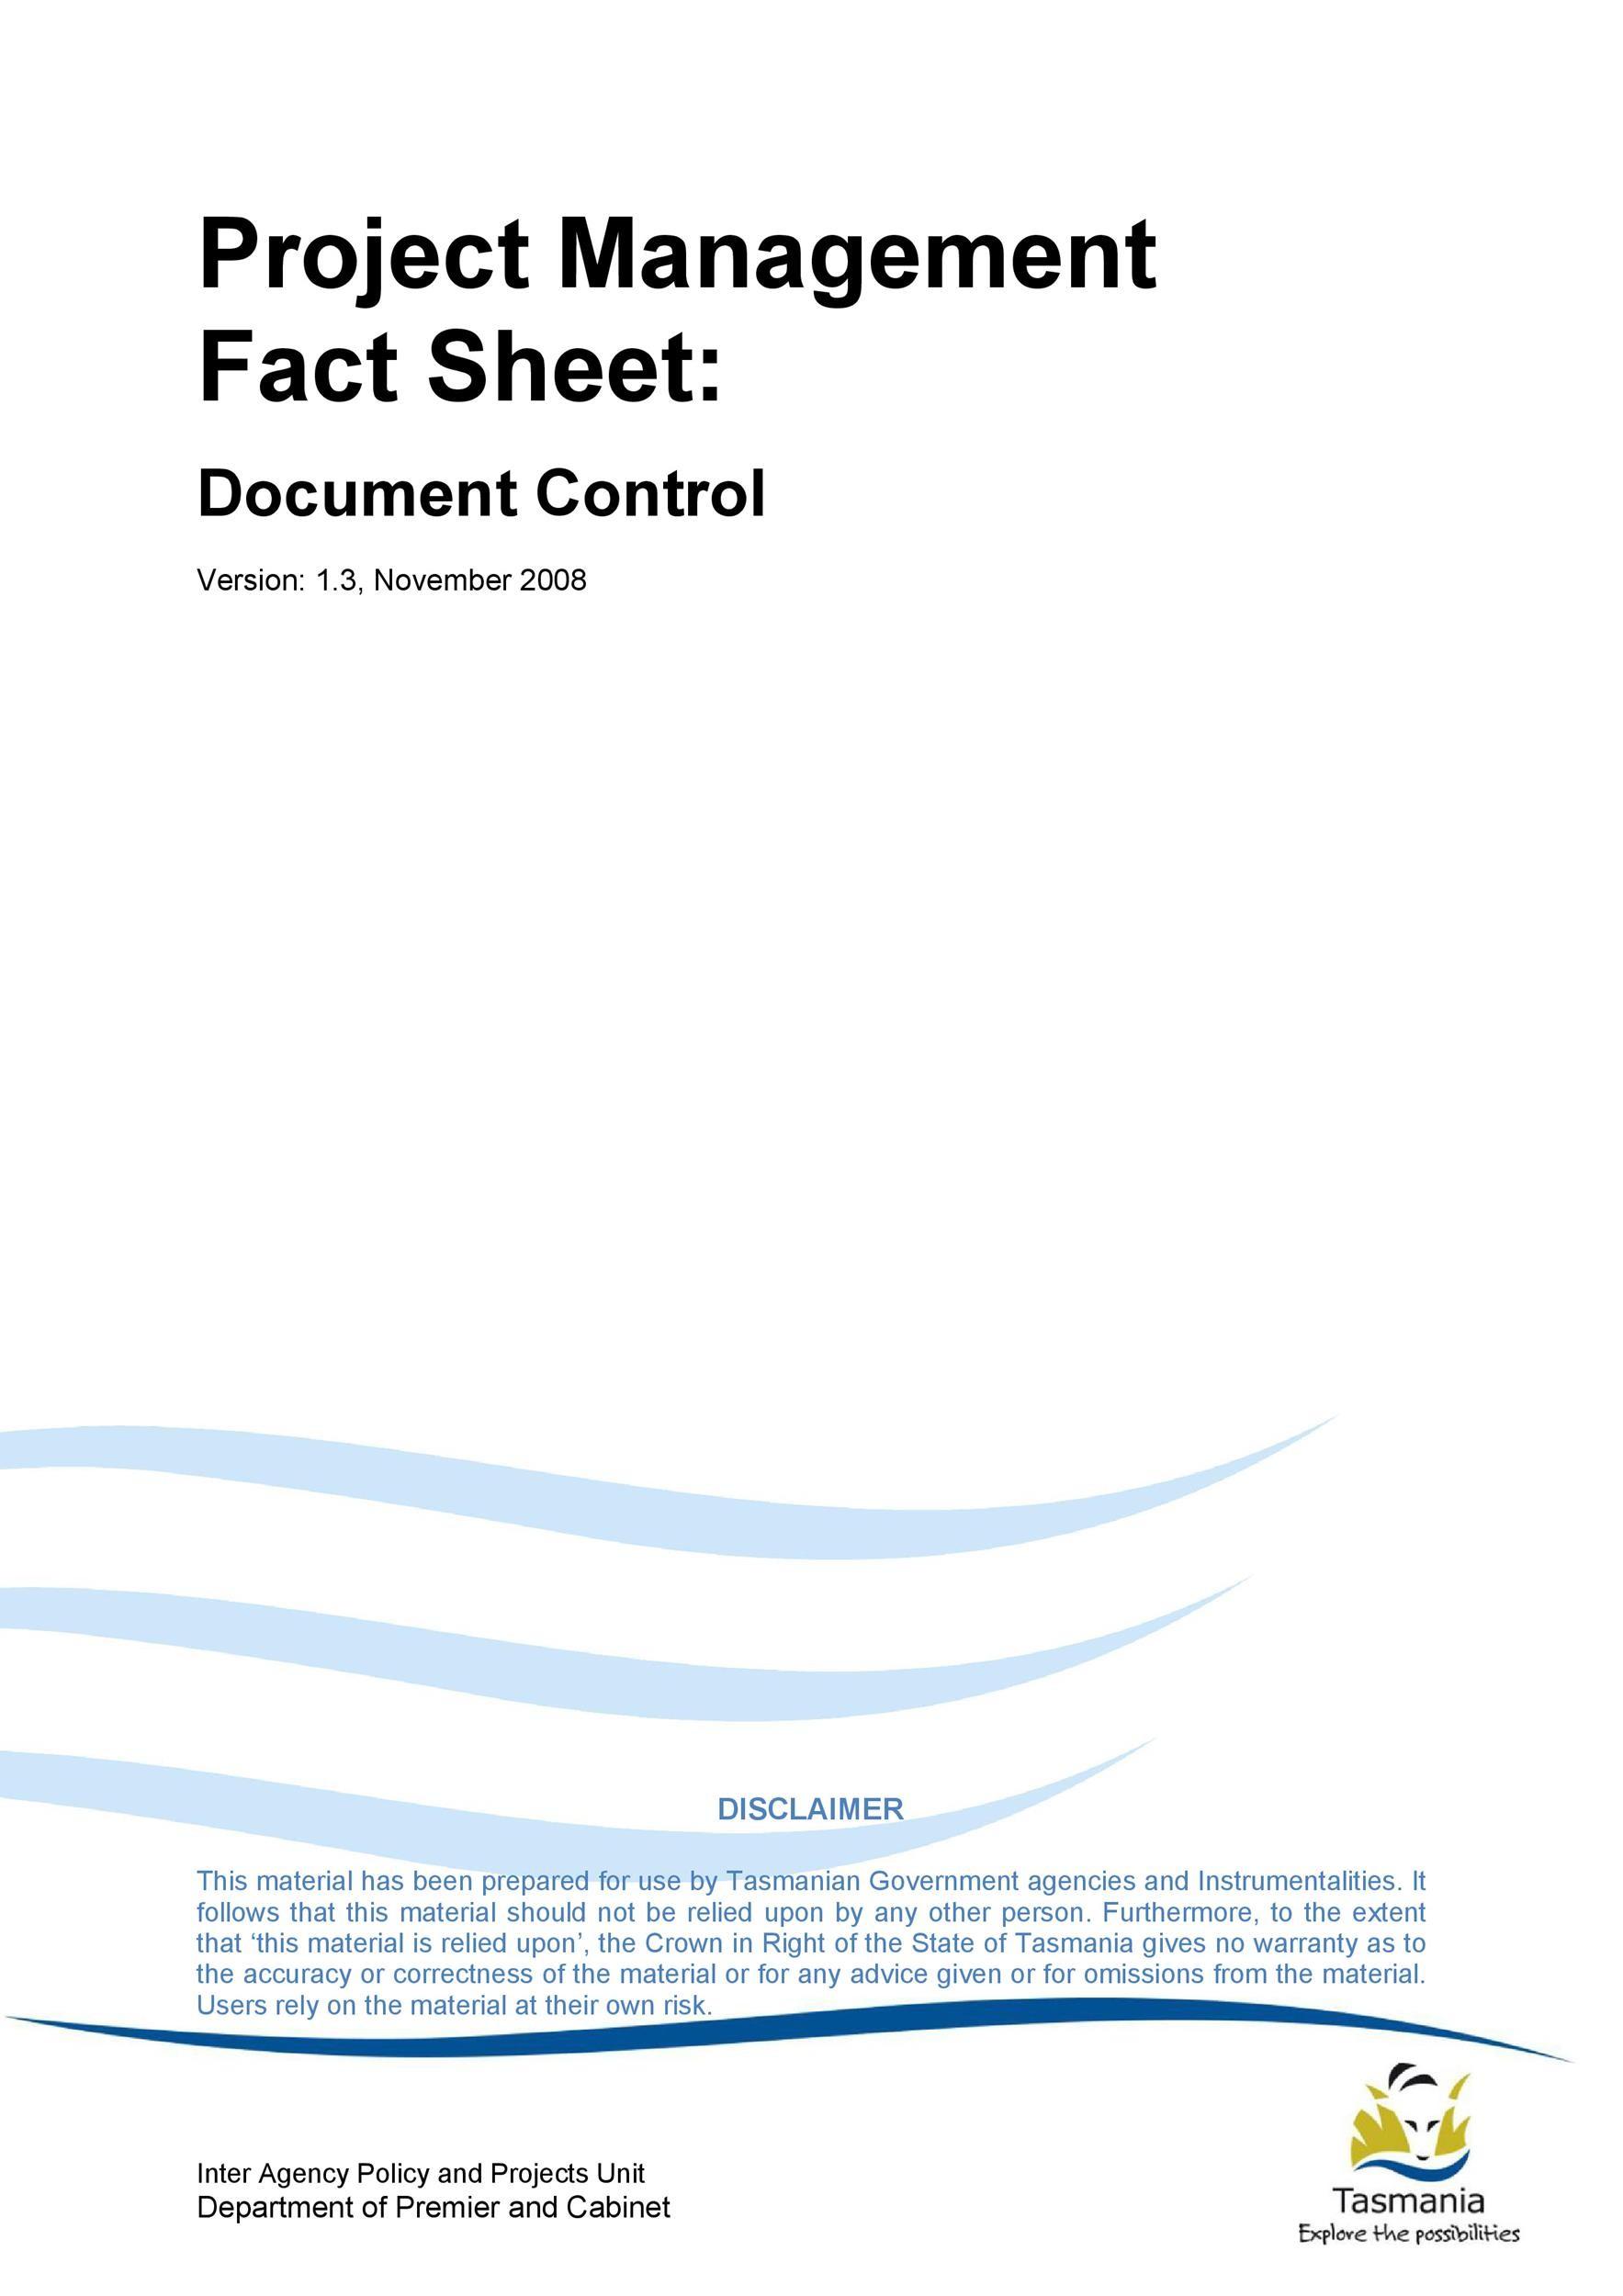 60+ Beautiful Fact Sheet Templates, Examples and Designs - information sheet templates